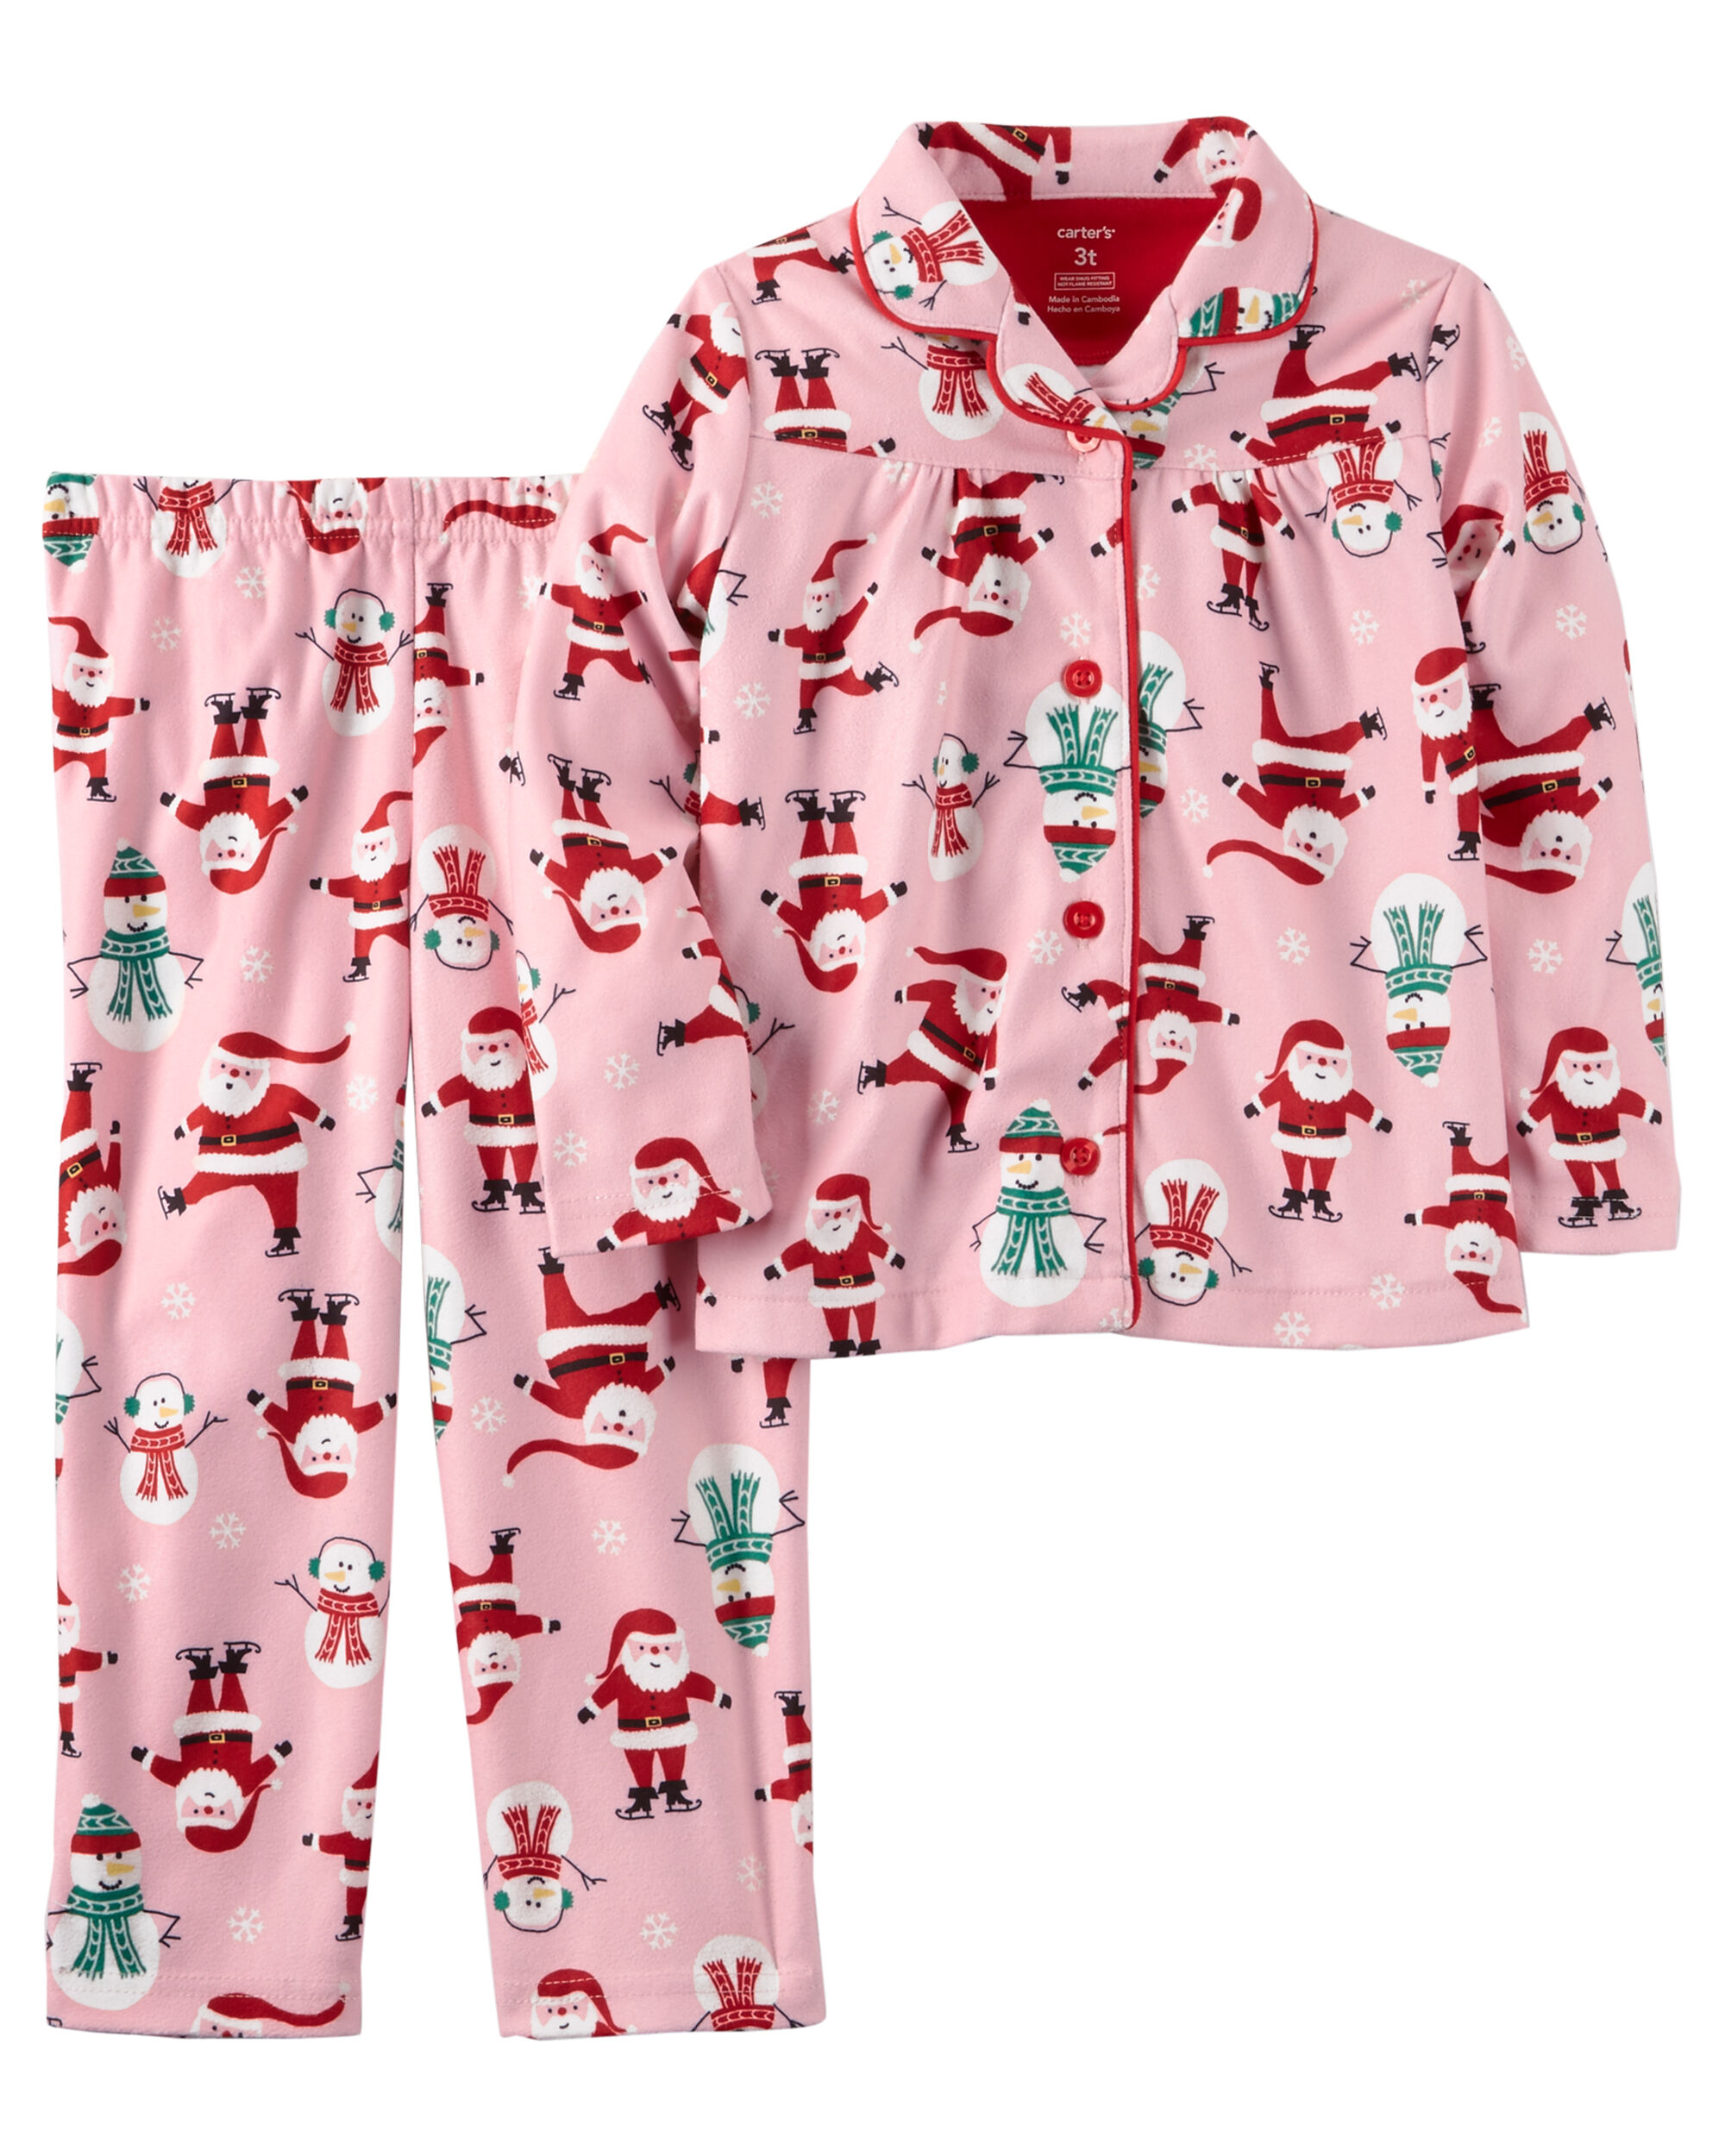 Toddler Girl Christmas Pajamas | Free Shipping | Carter's